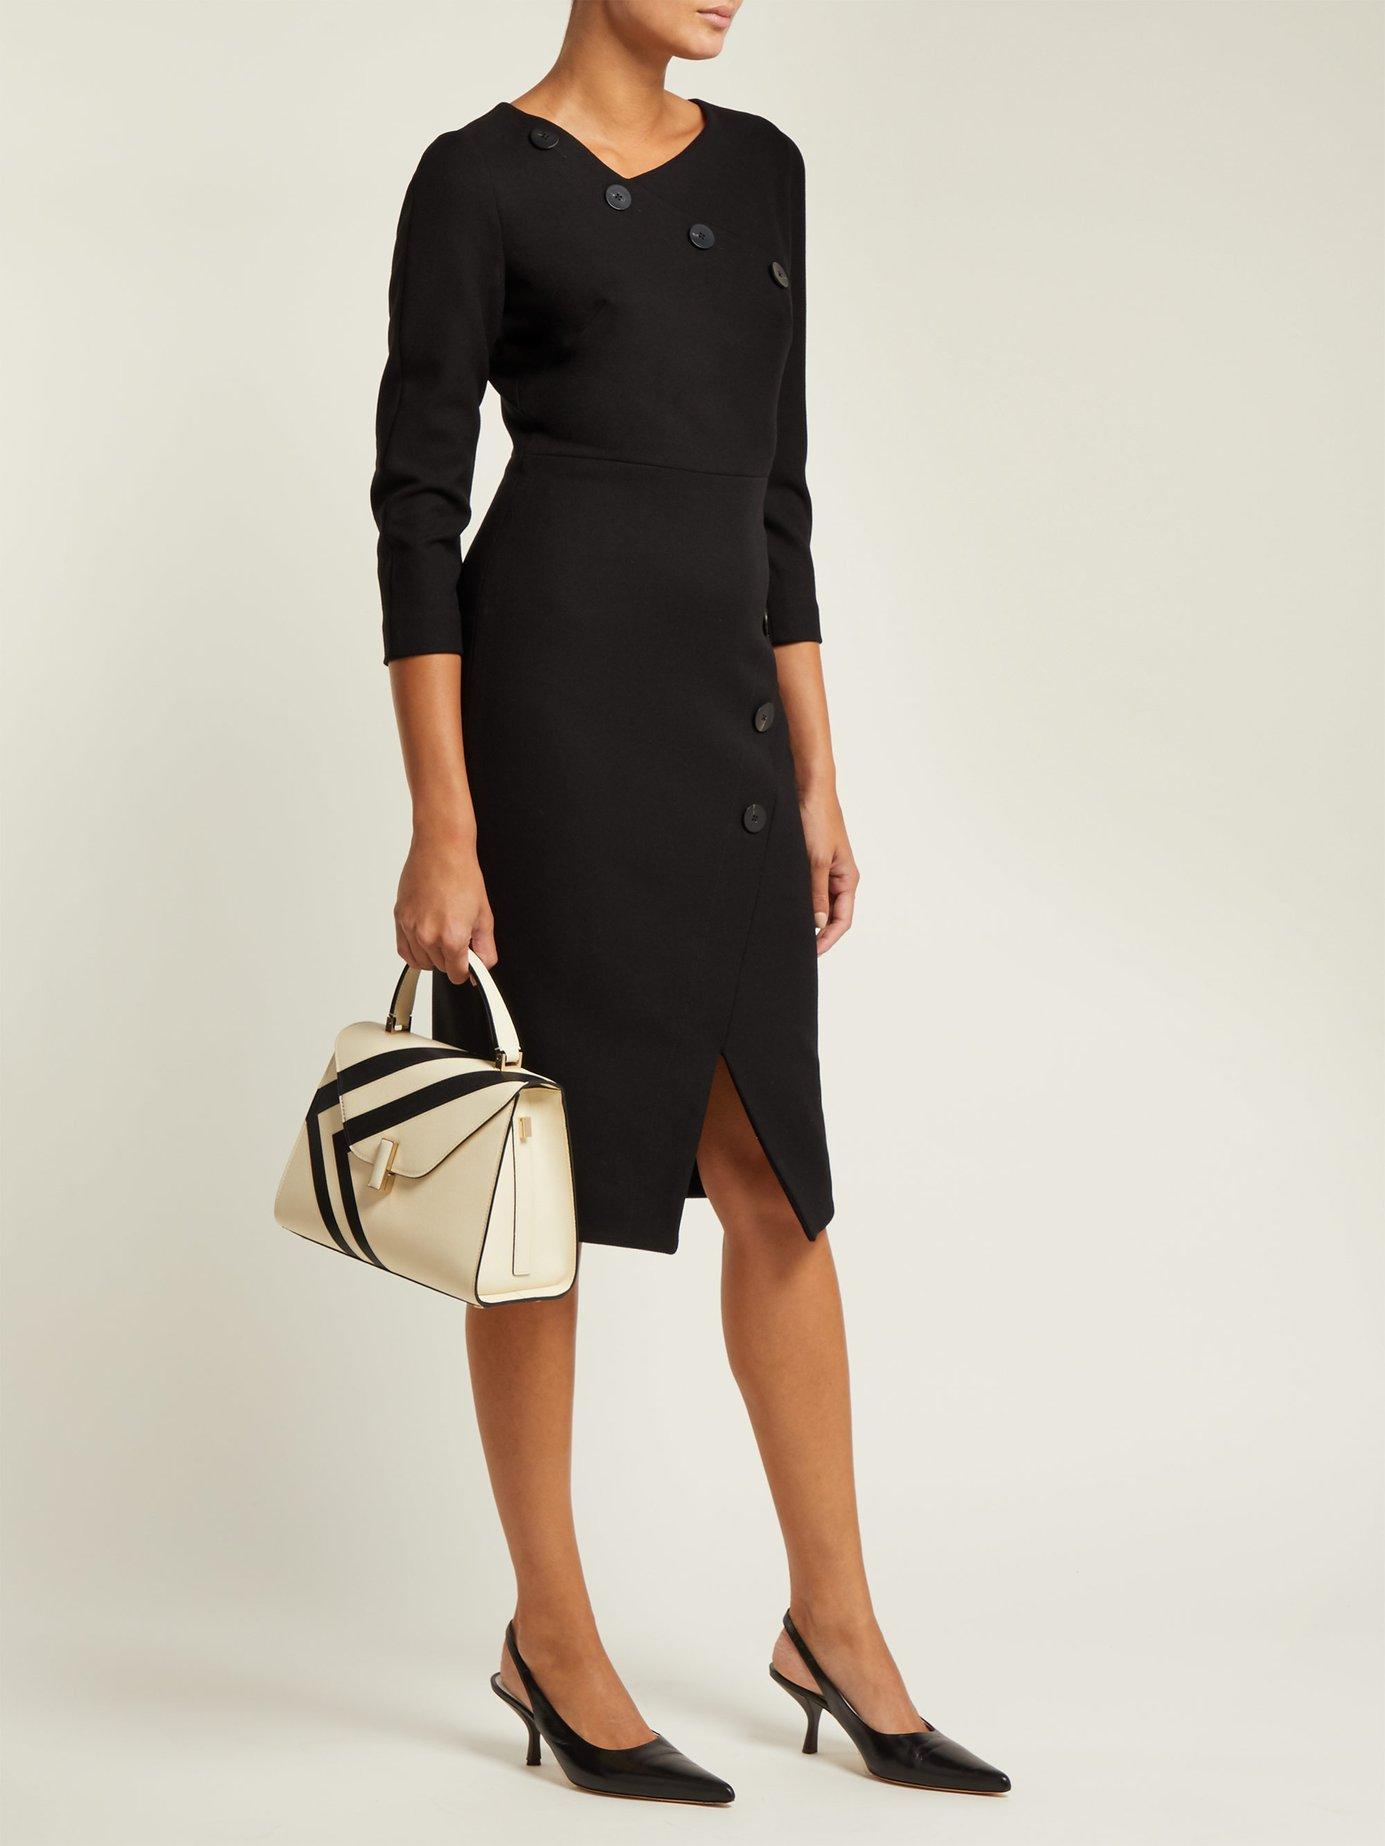 Button-embellished stretch-ponte midi dress by Cefinn